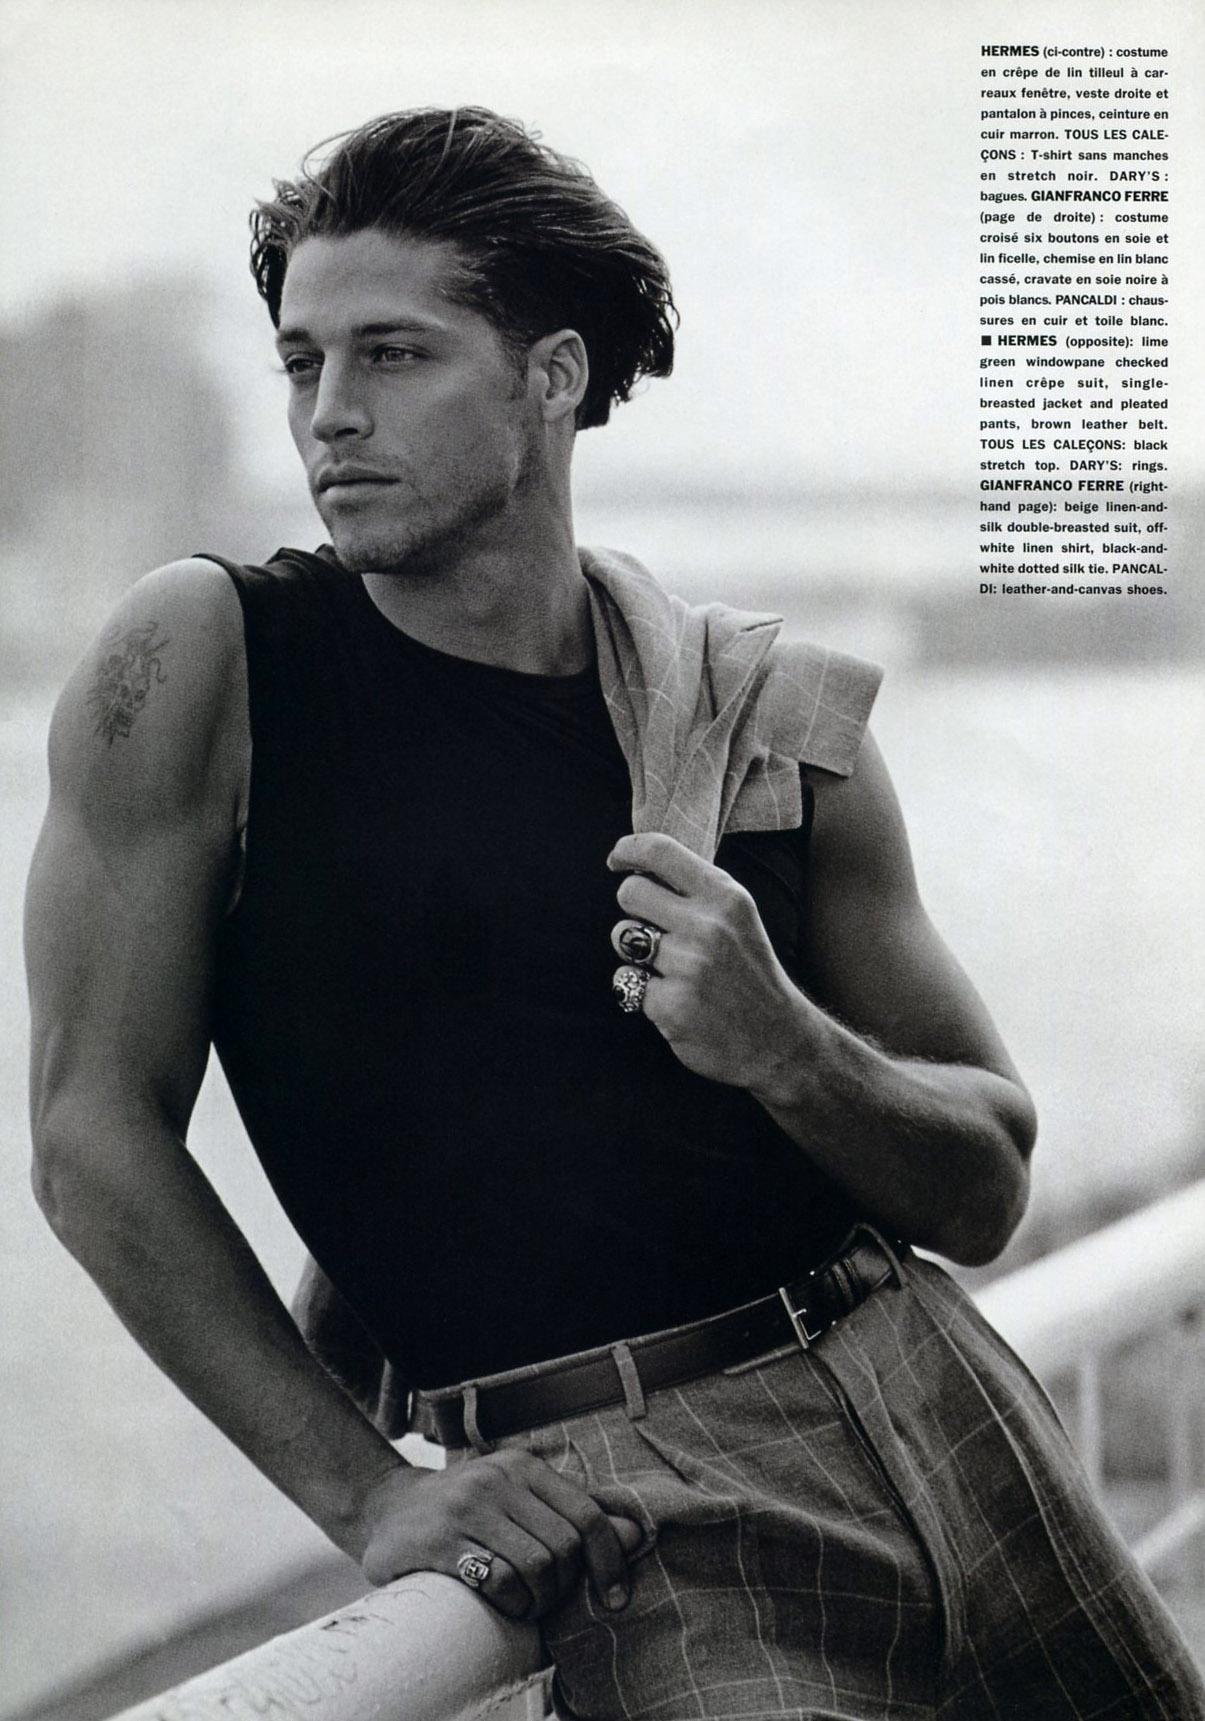 55061_Bryan_Randall_90s_Vogue_Hommes_International_-_Summertime_001_122_58lo.jpg